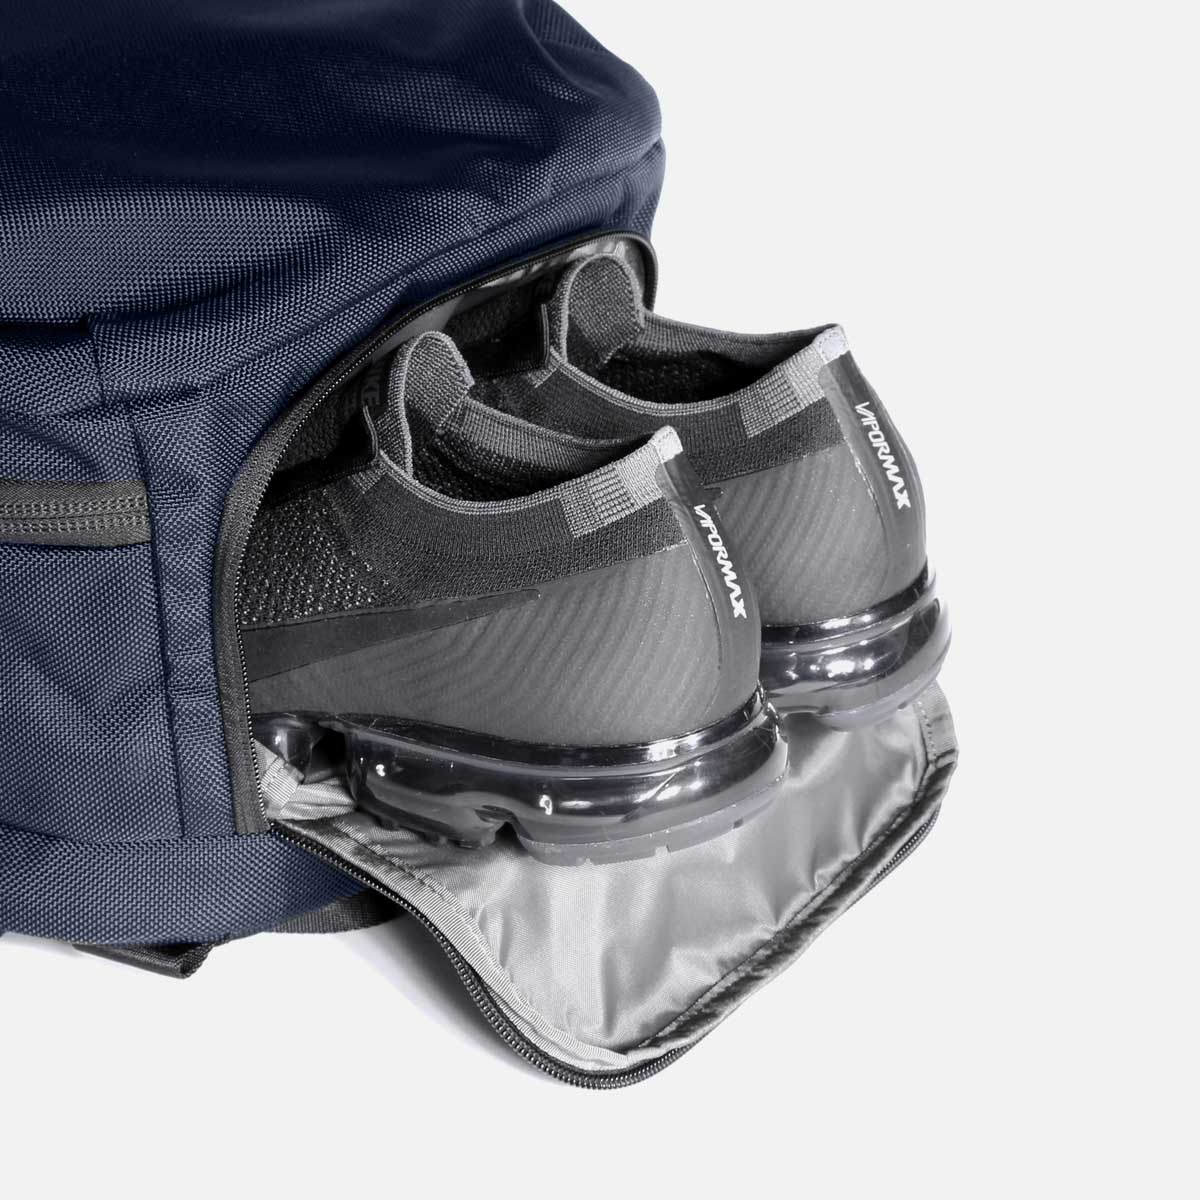 23007_travelpack2_navy_shoes.jpg